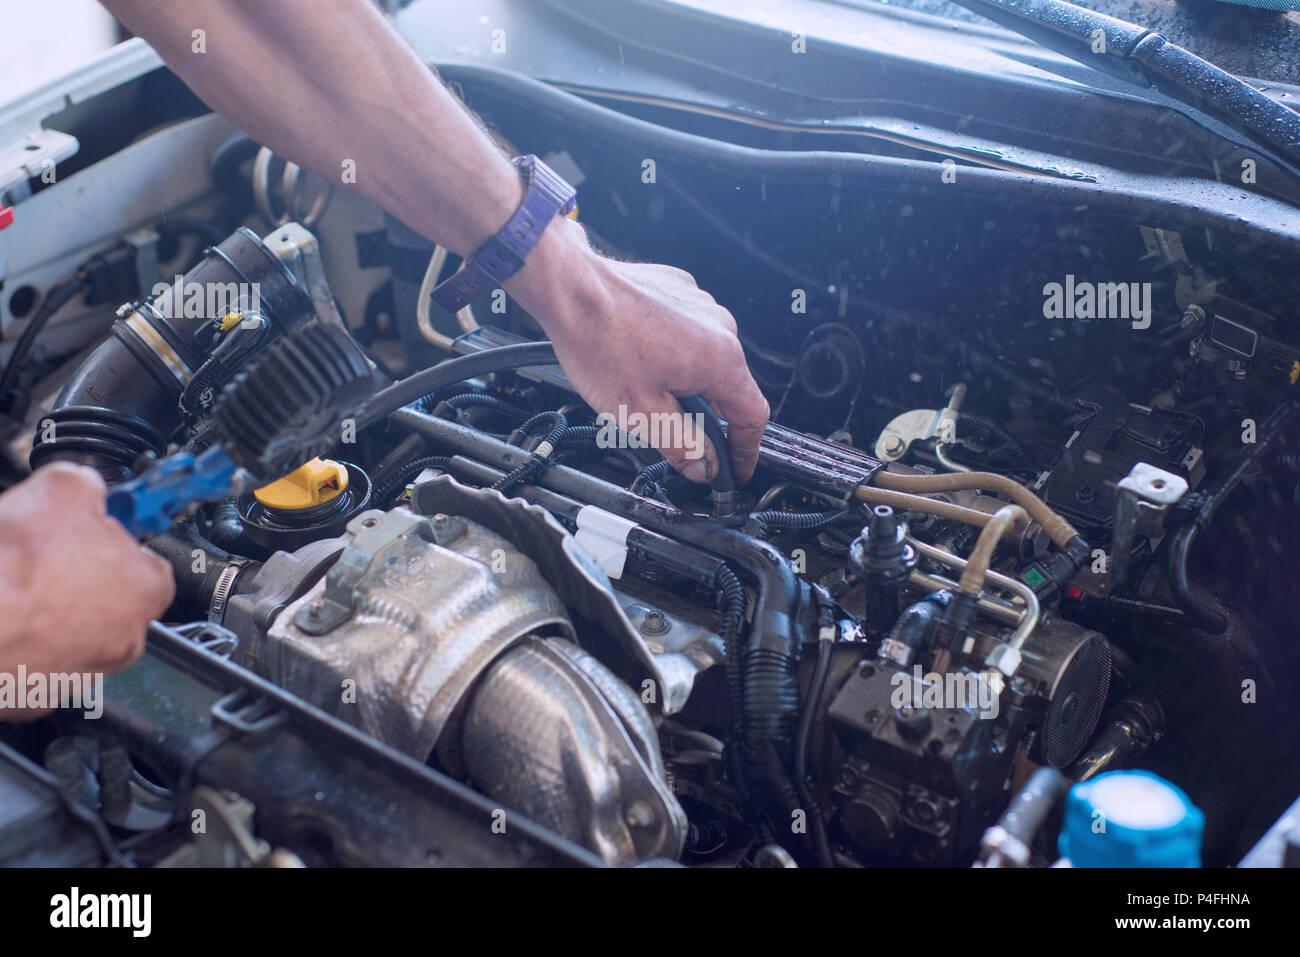 Auto mechanic repairing car. Selective focus. - Stock Image